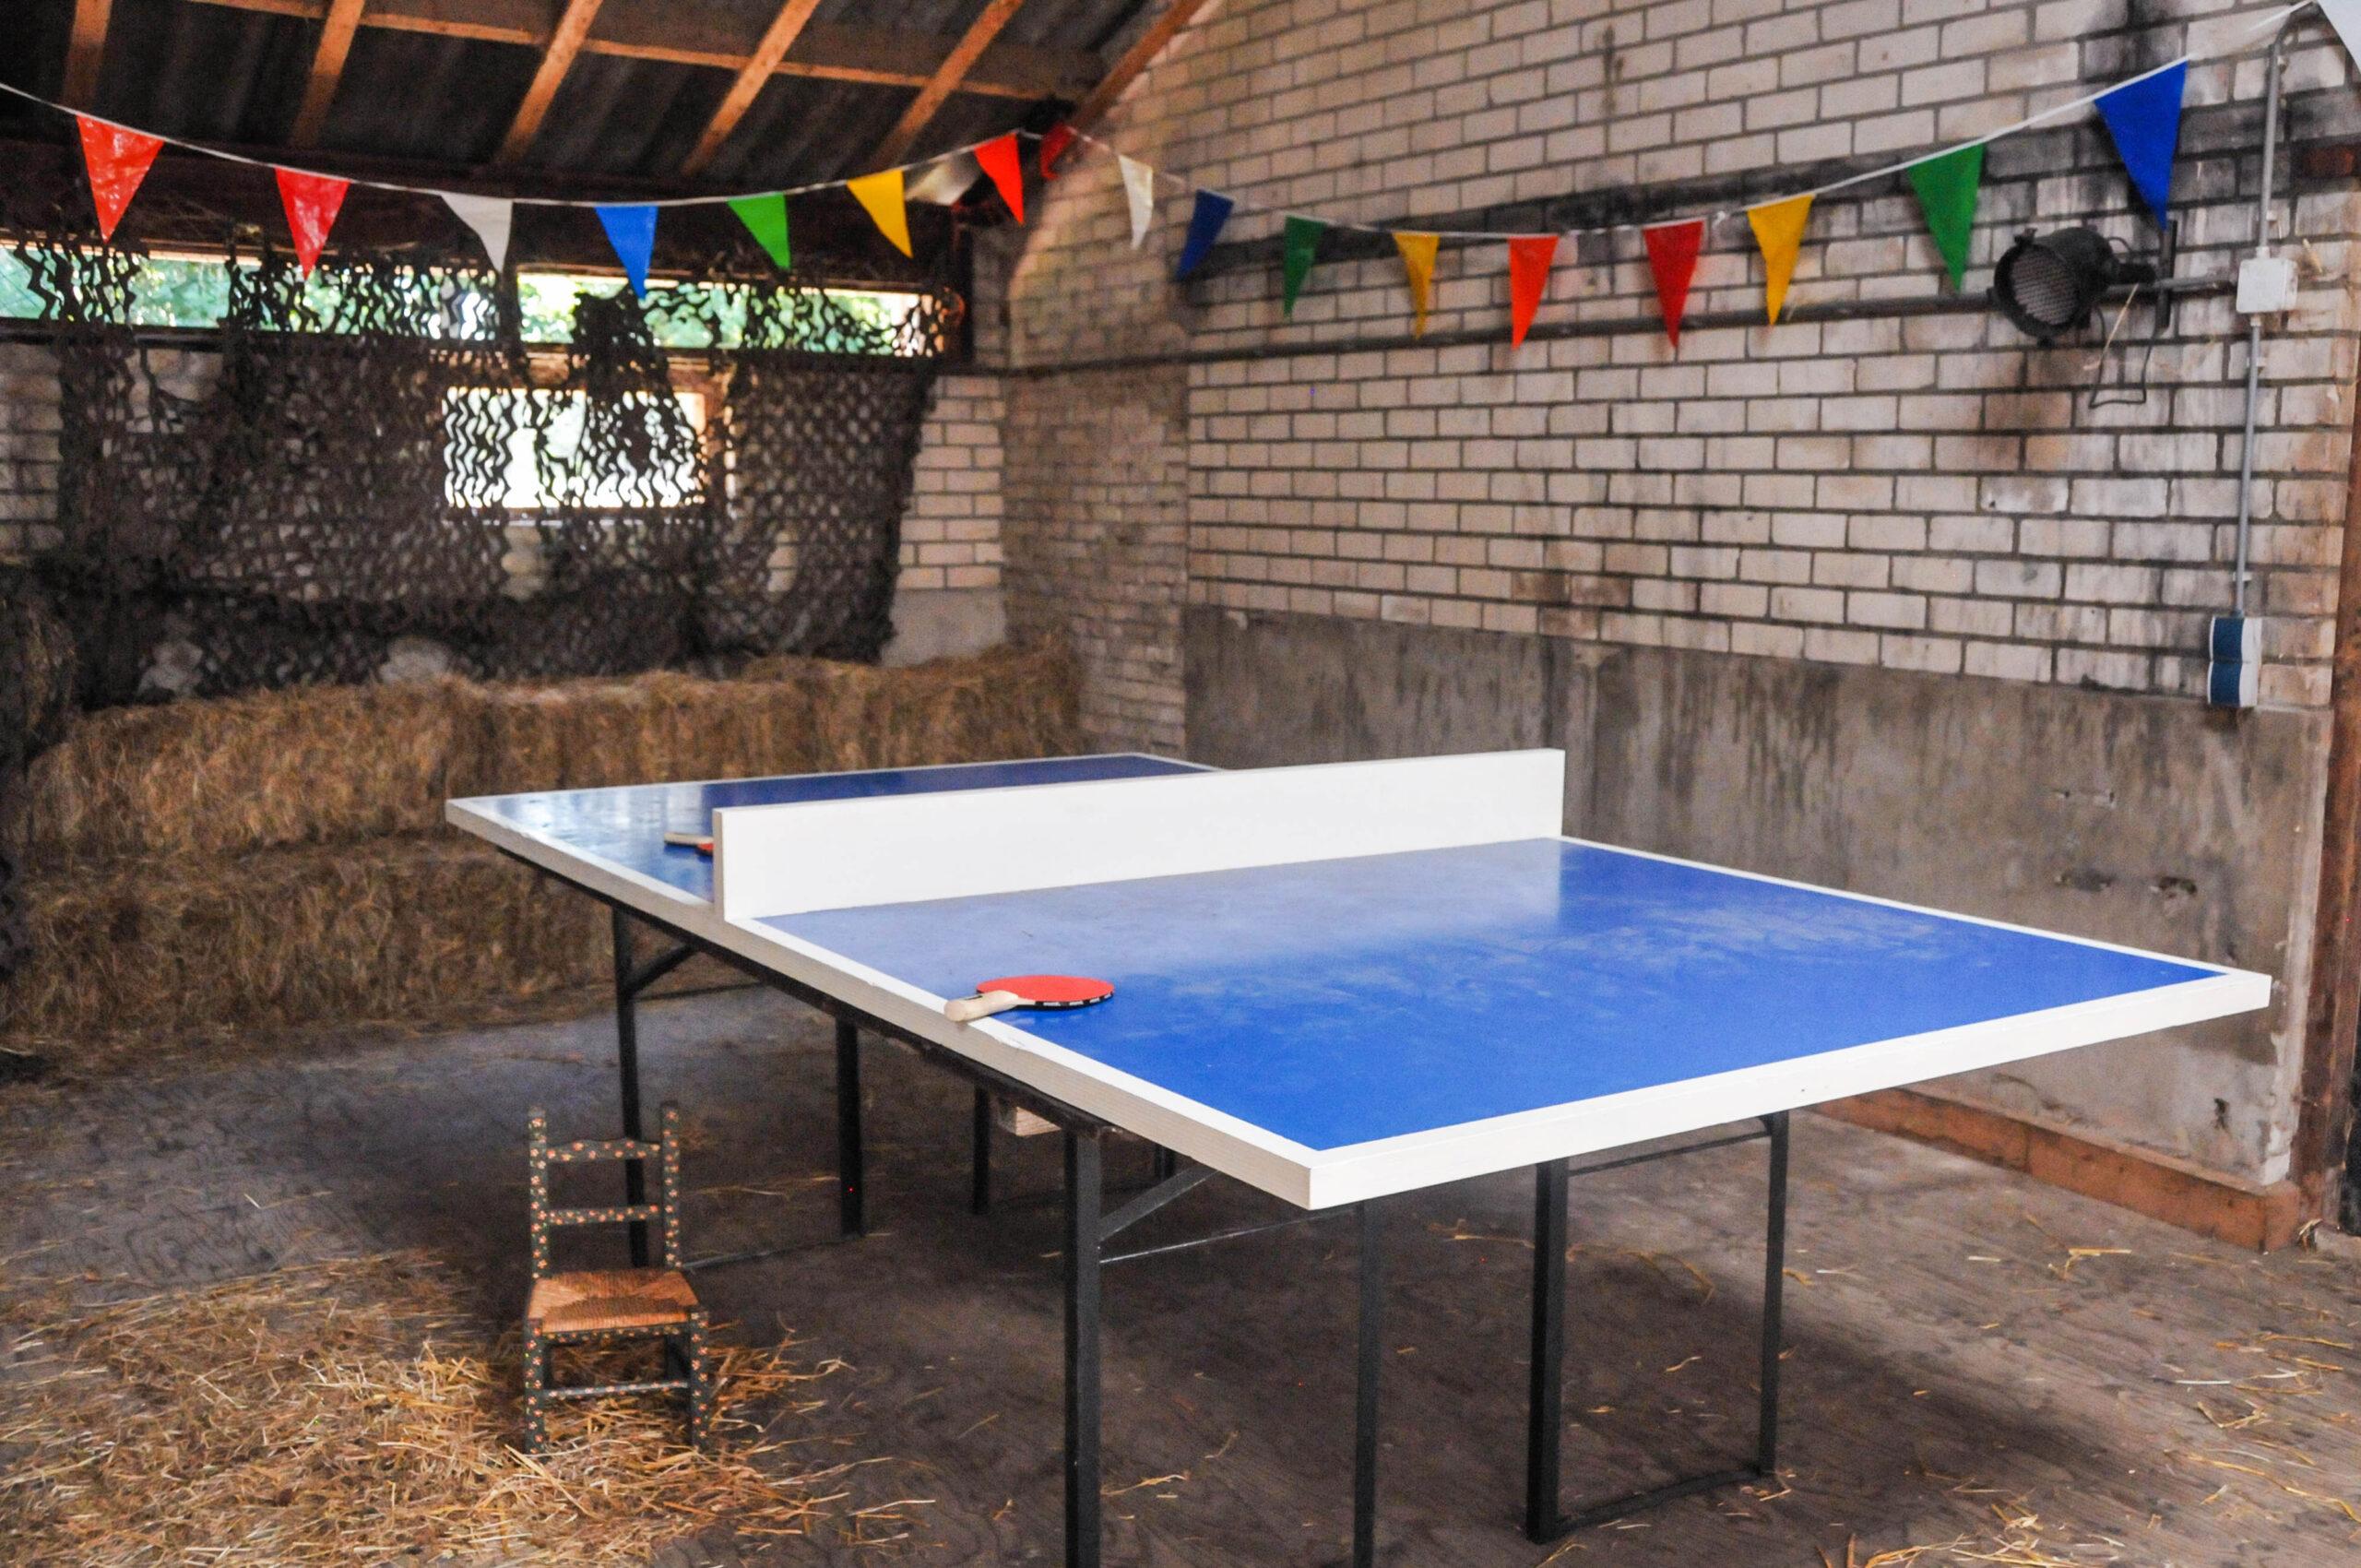 Faciliteiten en horeca   Camping de Boerinn